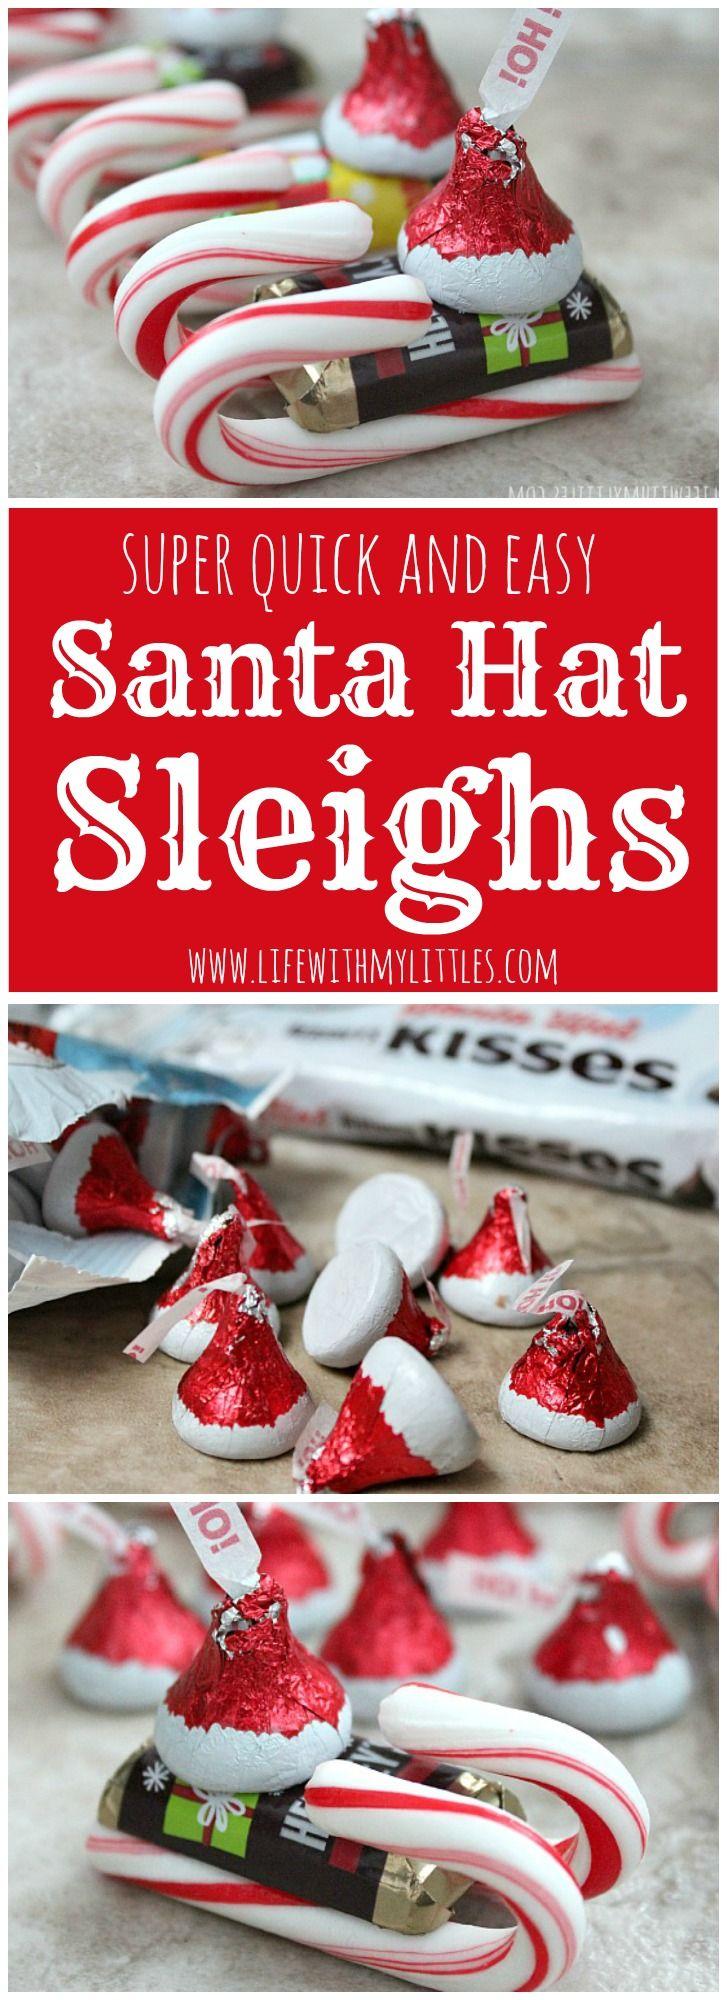 candy santa hat sleighs simple diy santa hat and diy christmas